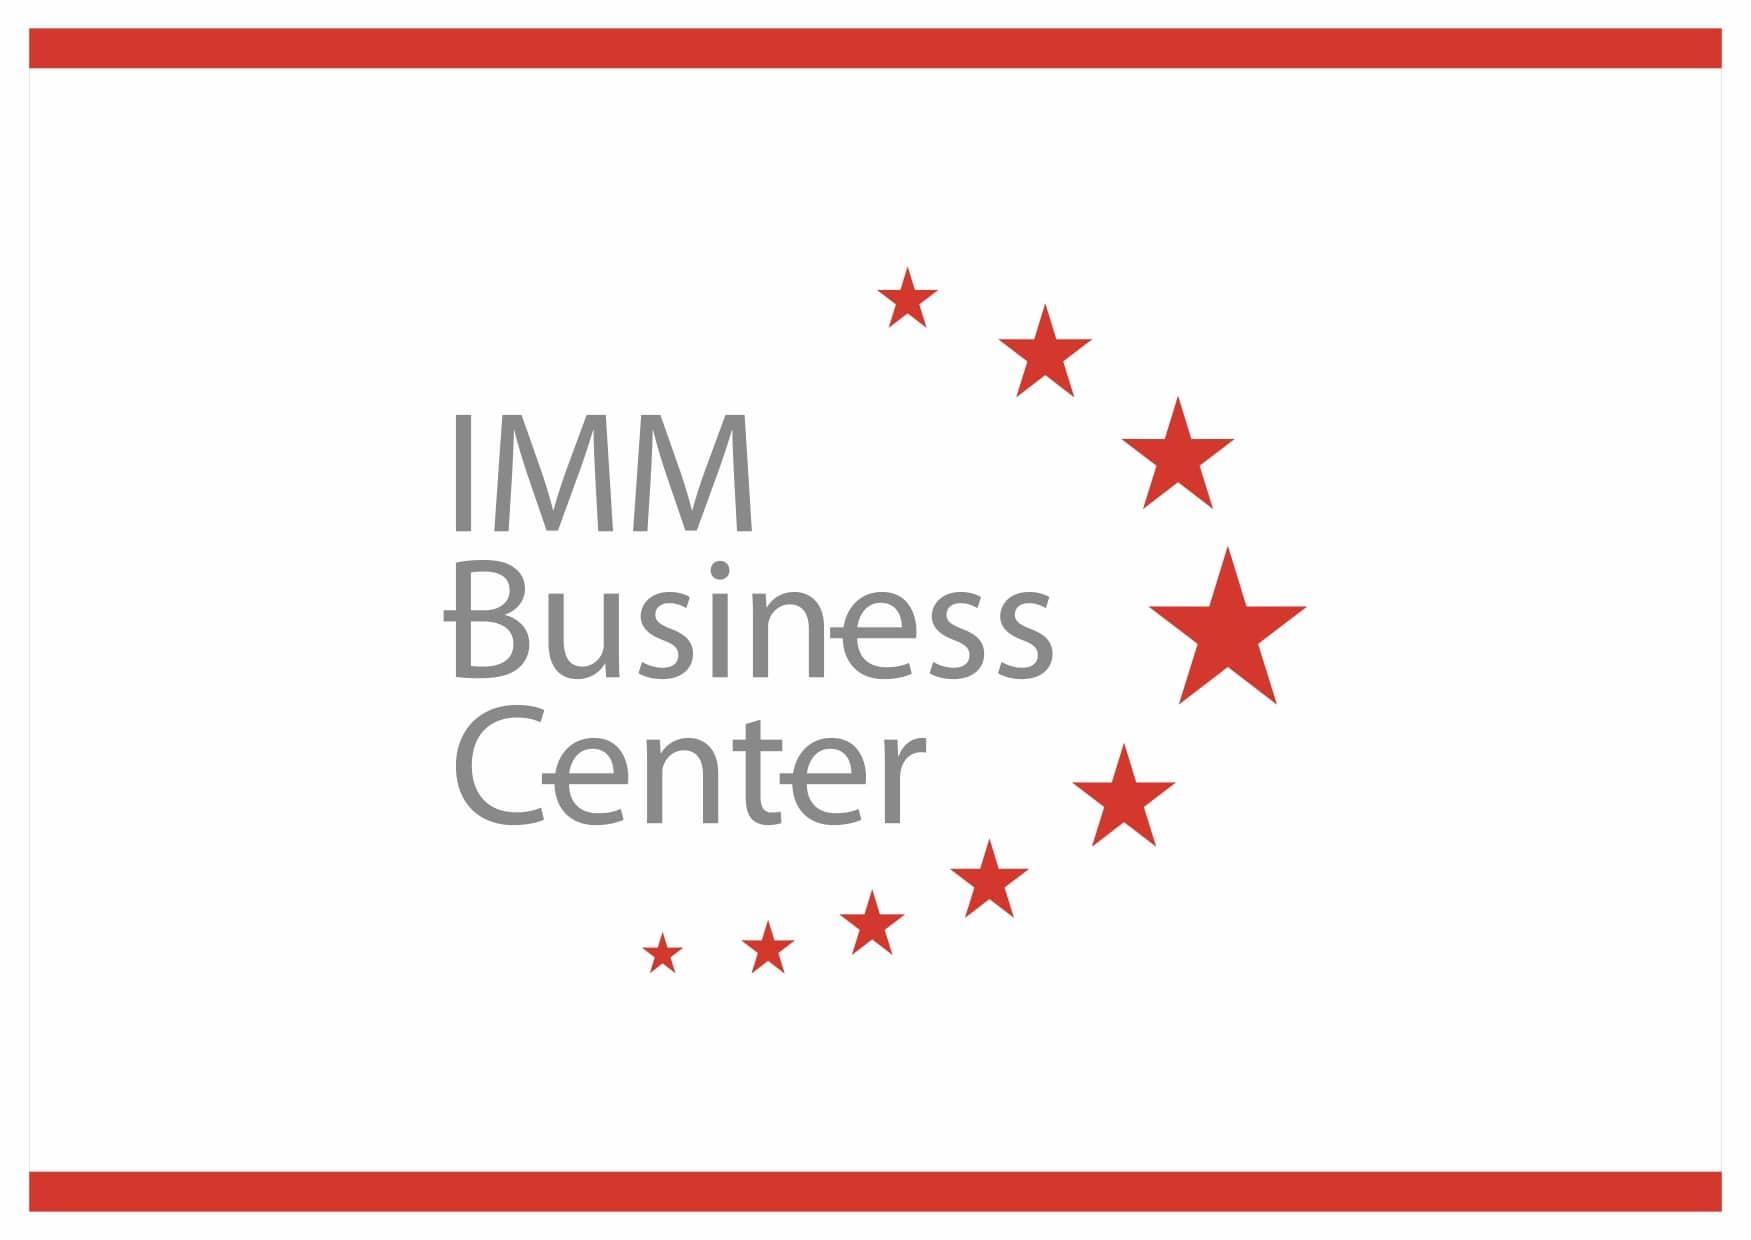 IMM Business Center